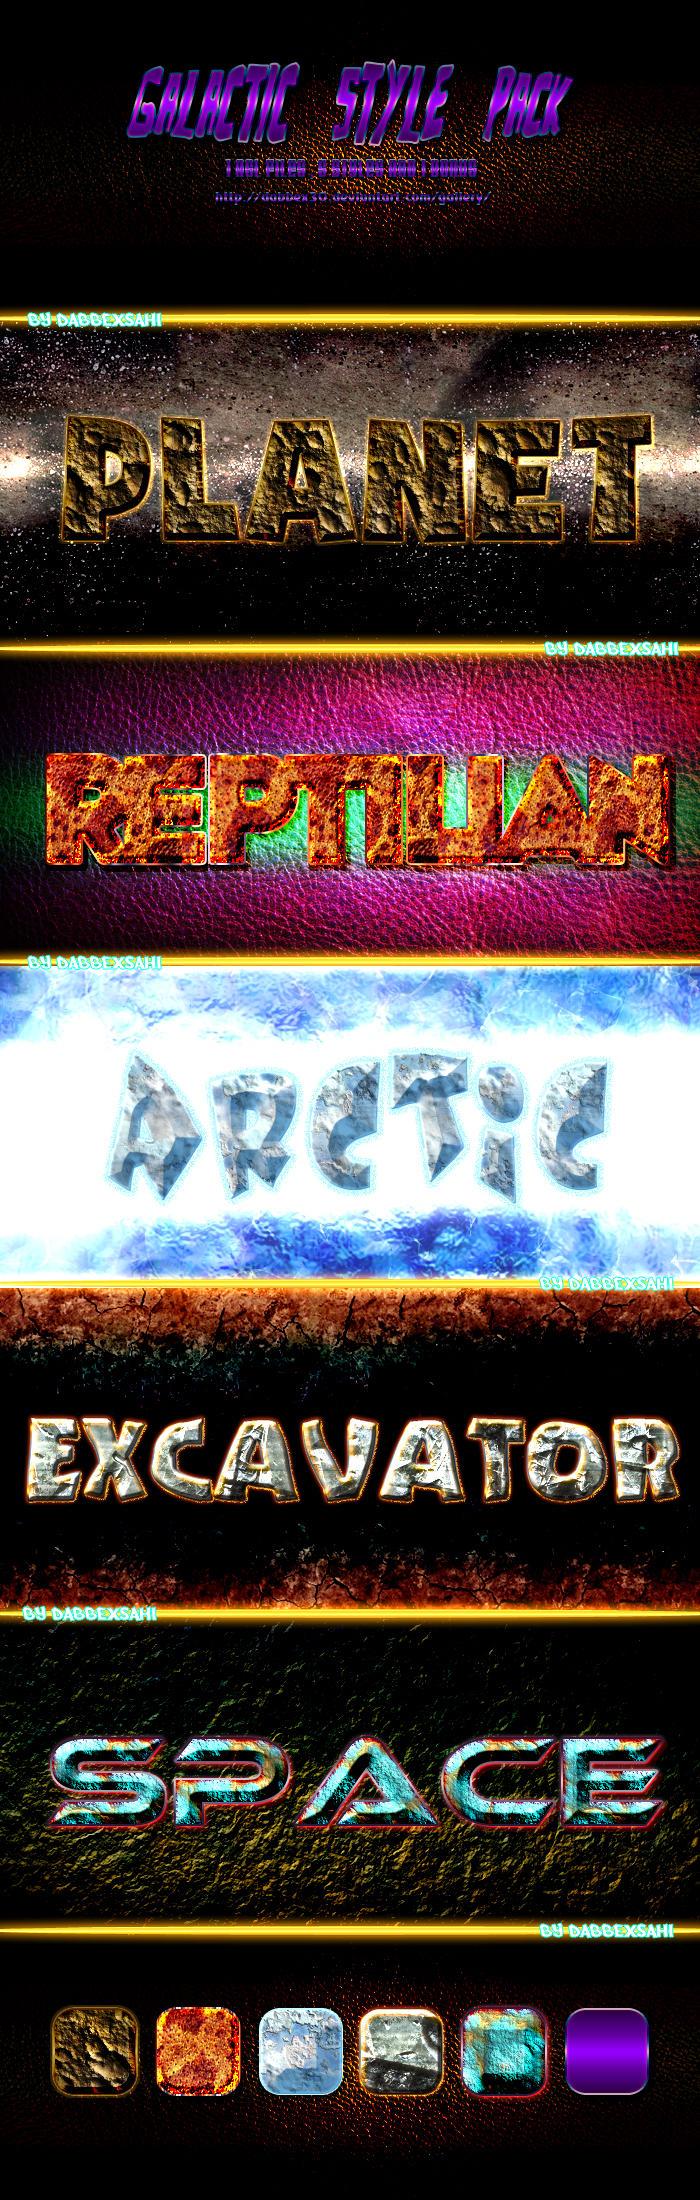 http://fc03.deviantart.net/fs70/i/2012/148/0/a/galactic_theme_ps_styles_by_dabbex30-d51d3ln.jpg